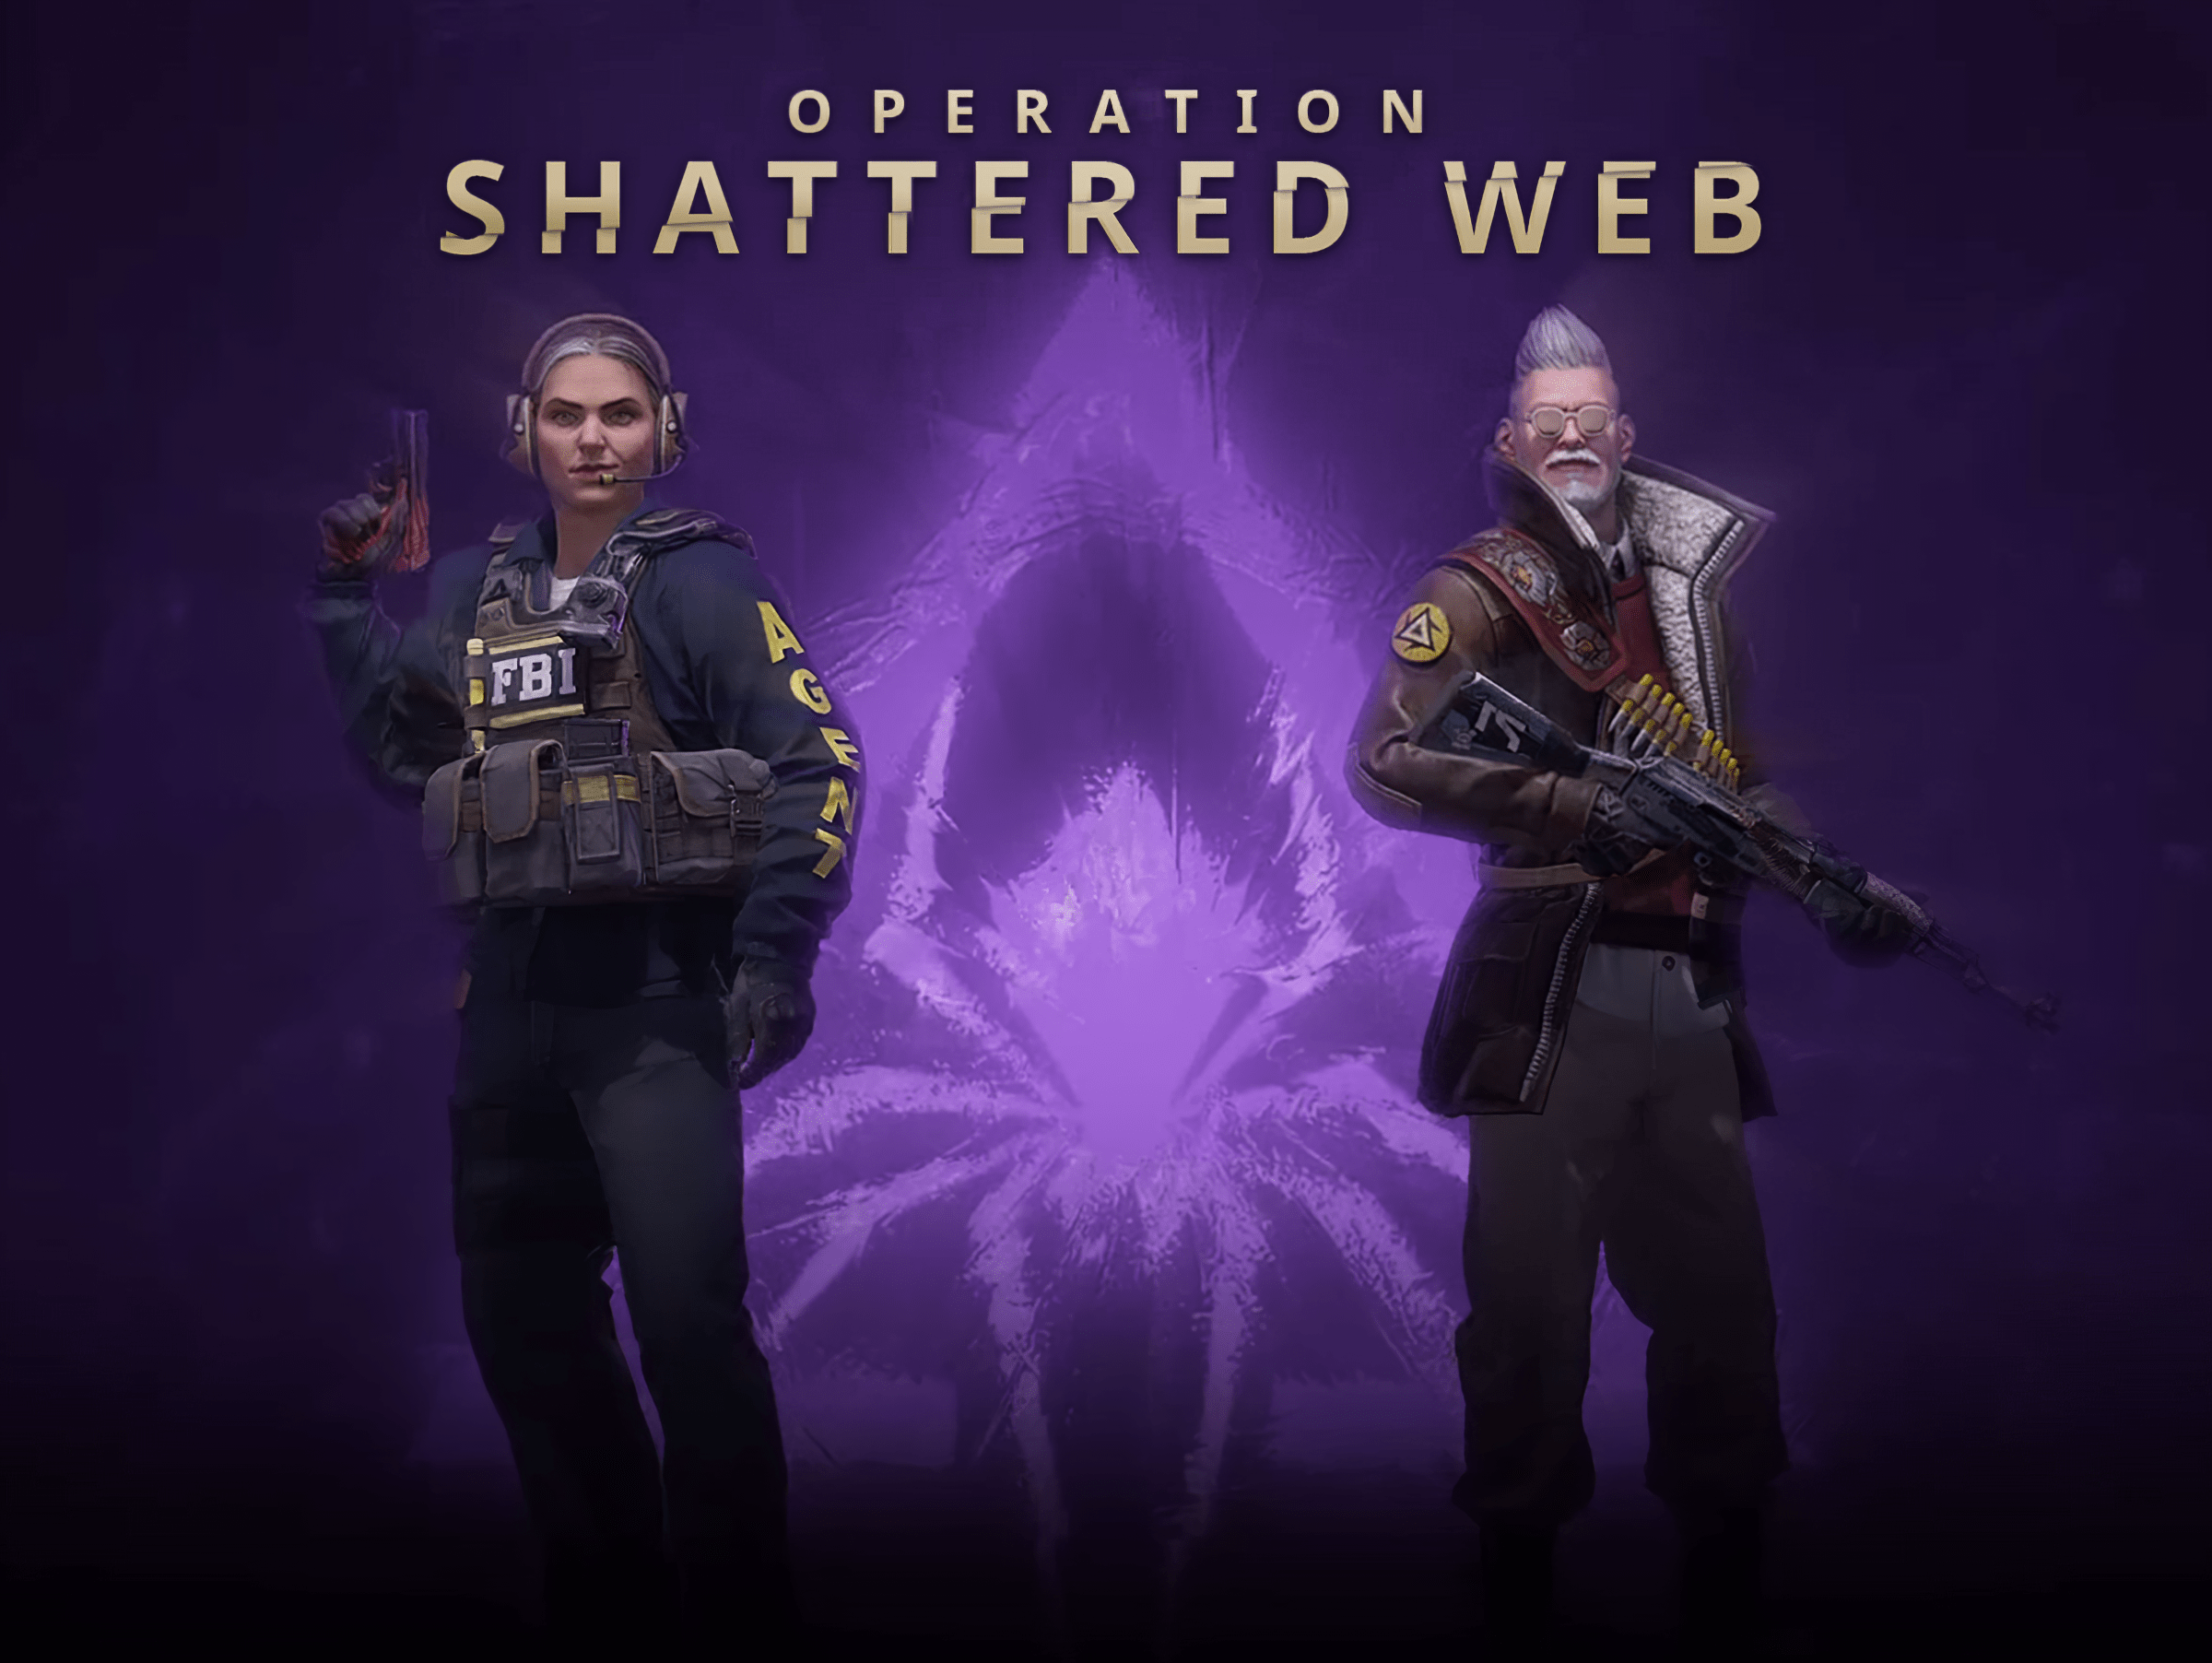 csgo-operation-shatteredweb